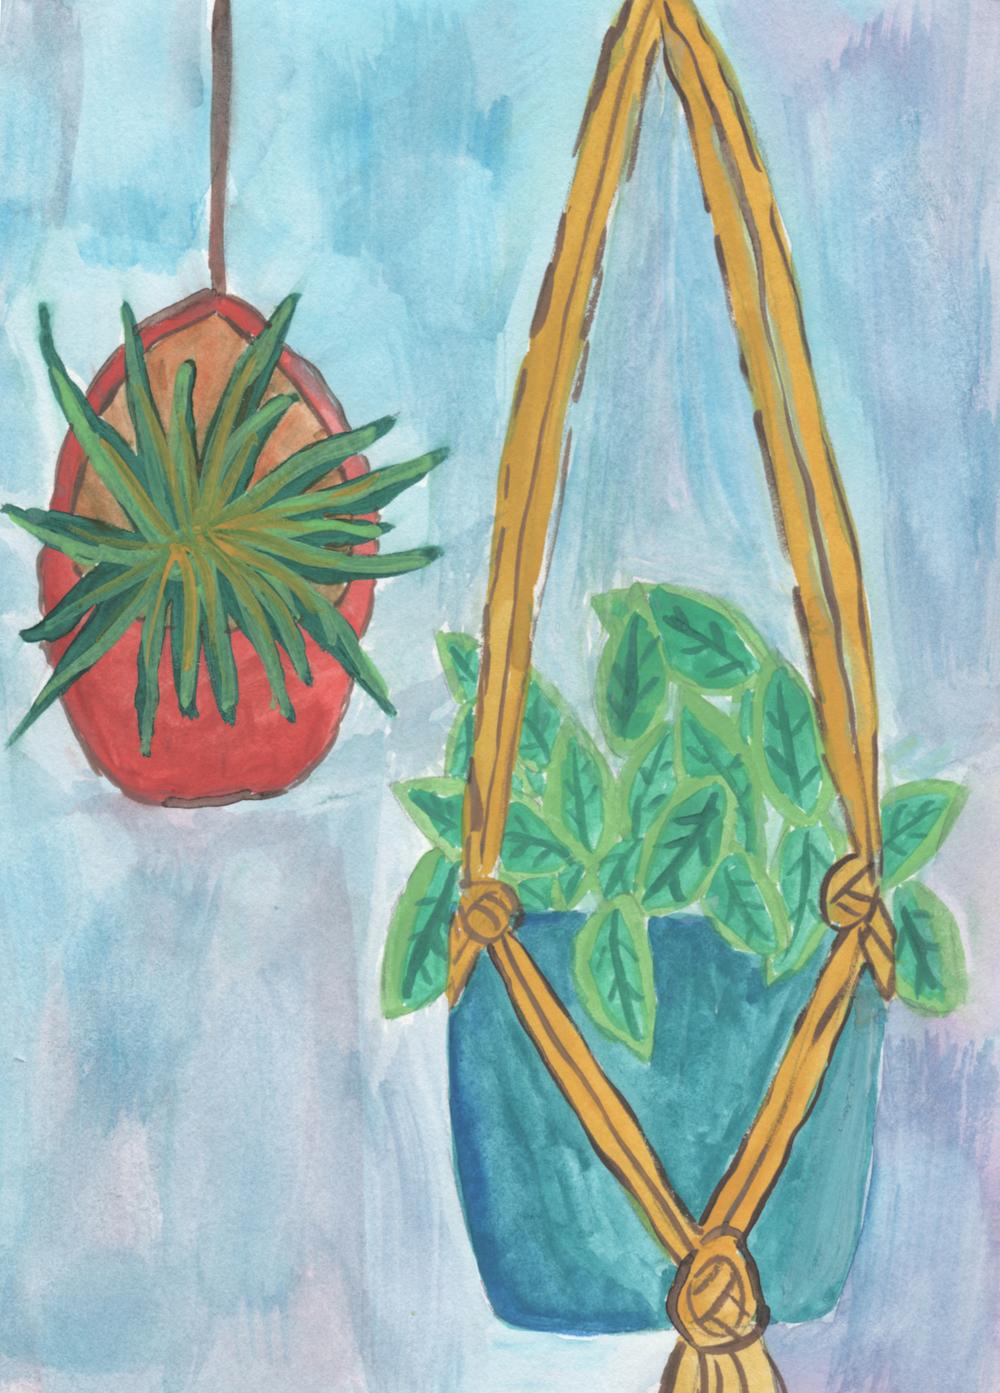 macrame plant hanging drawing nicole stevenson studio.jpg